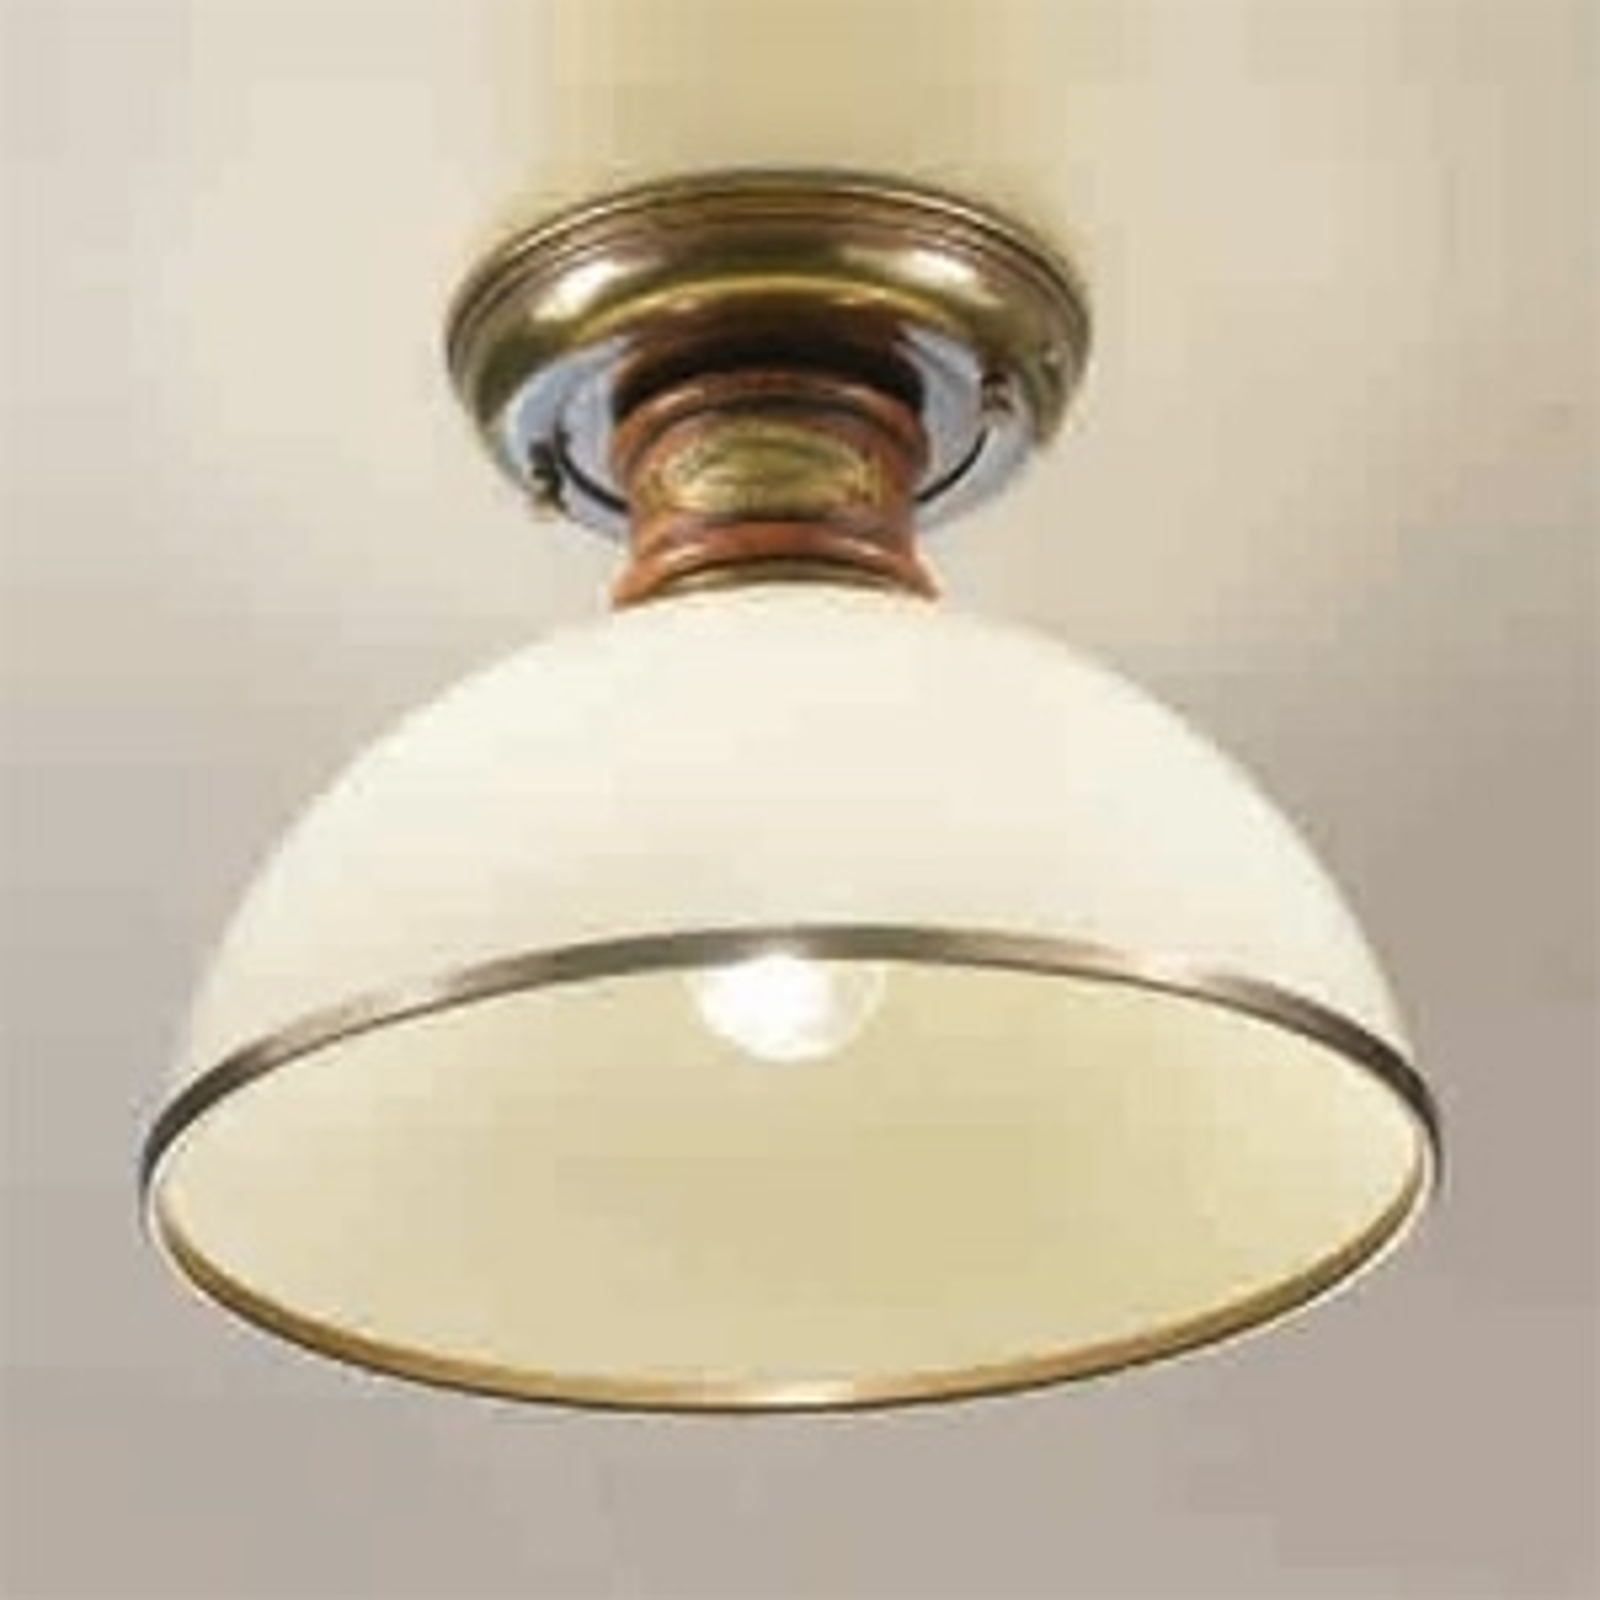 Elfenbensfarget Libeccio taklampe av glass